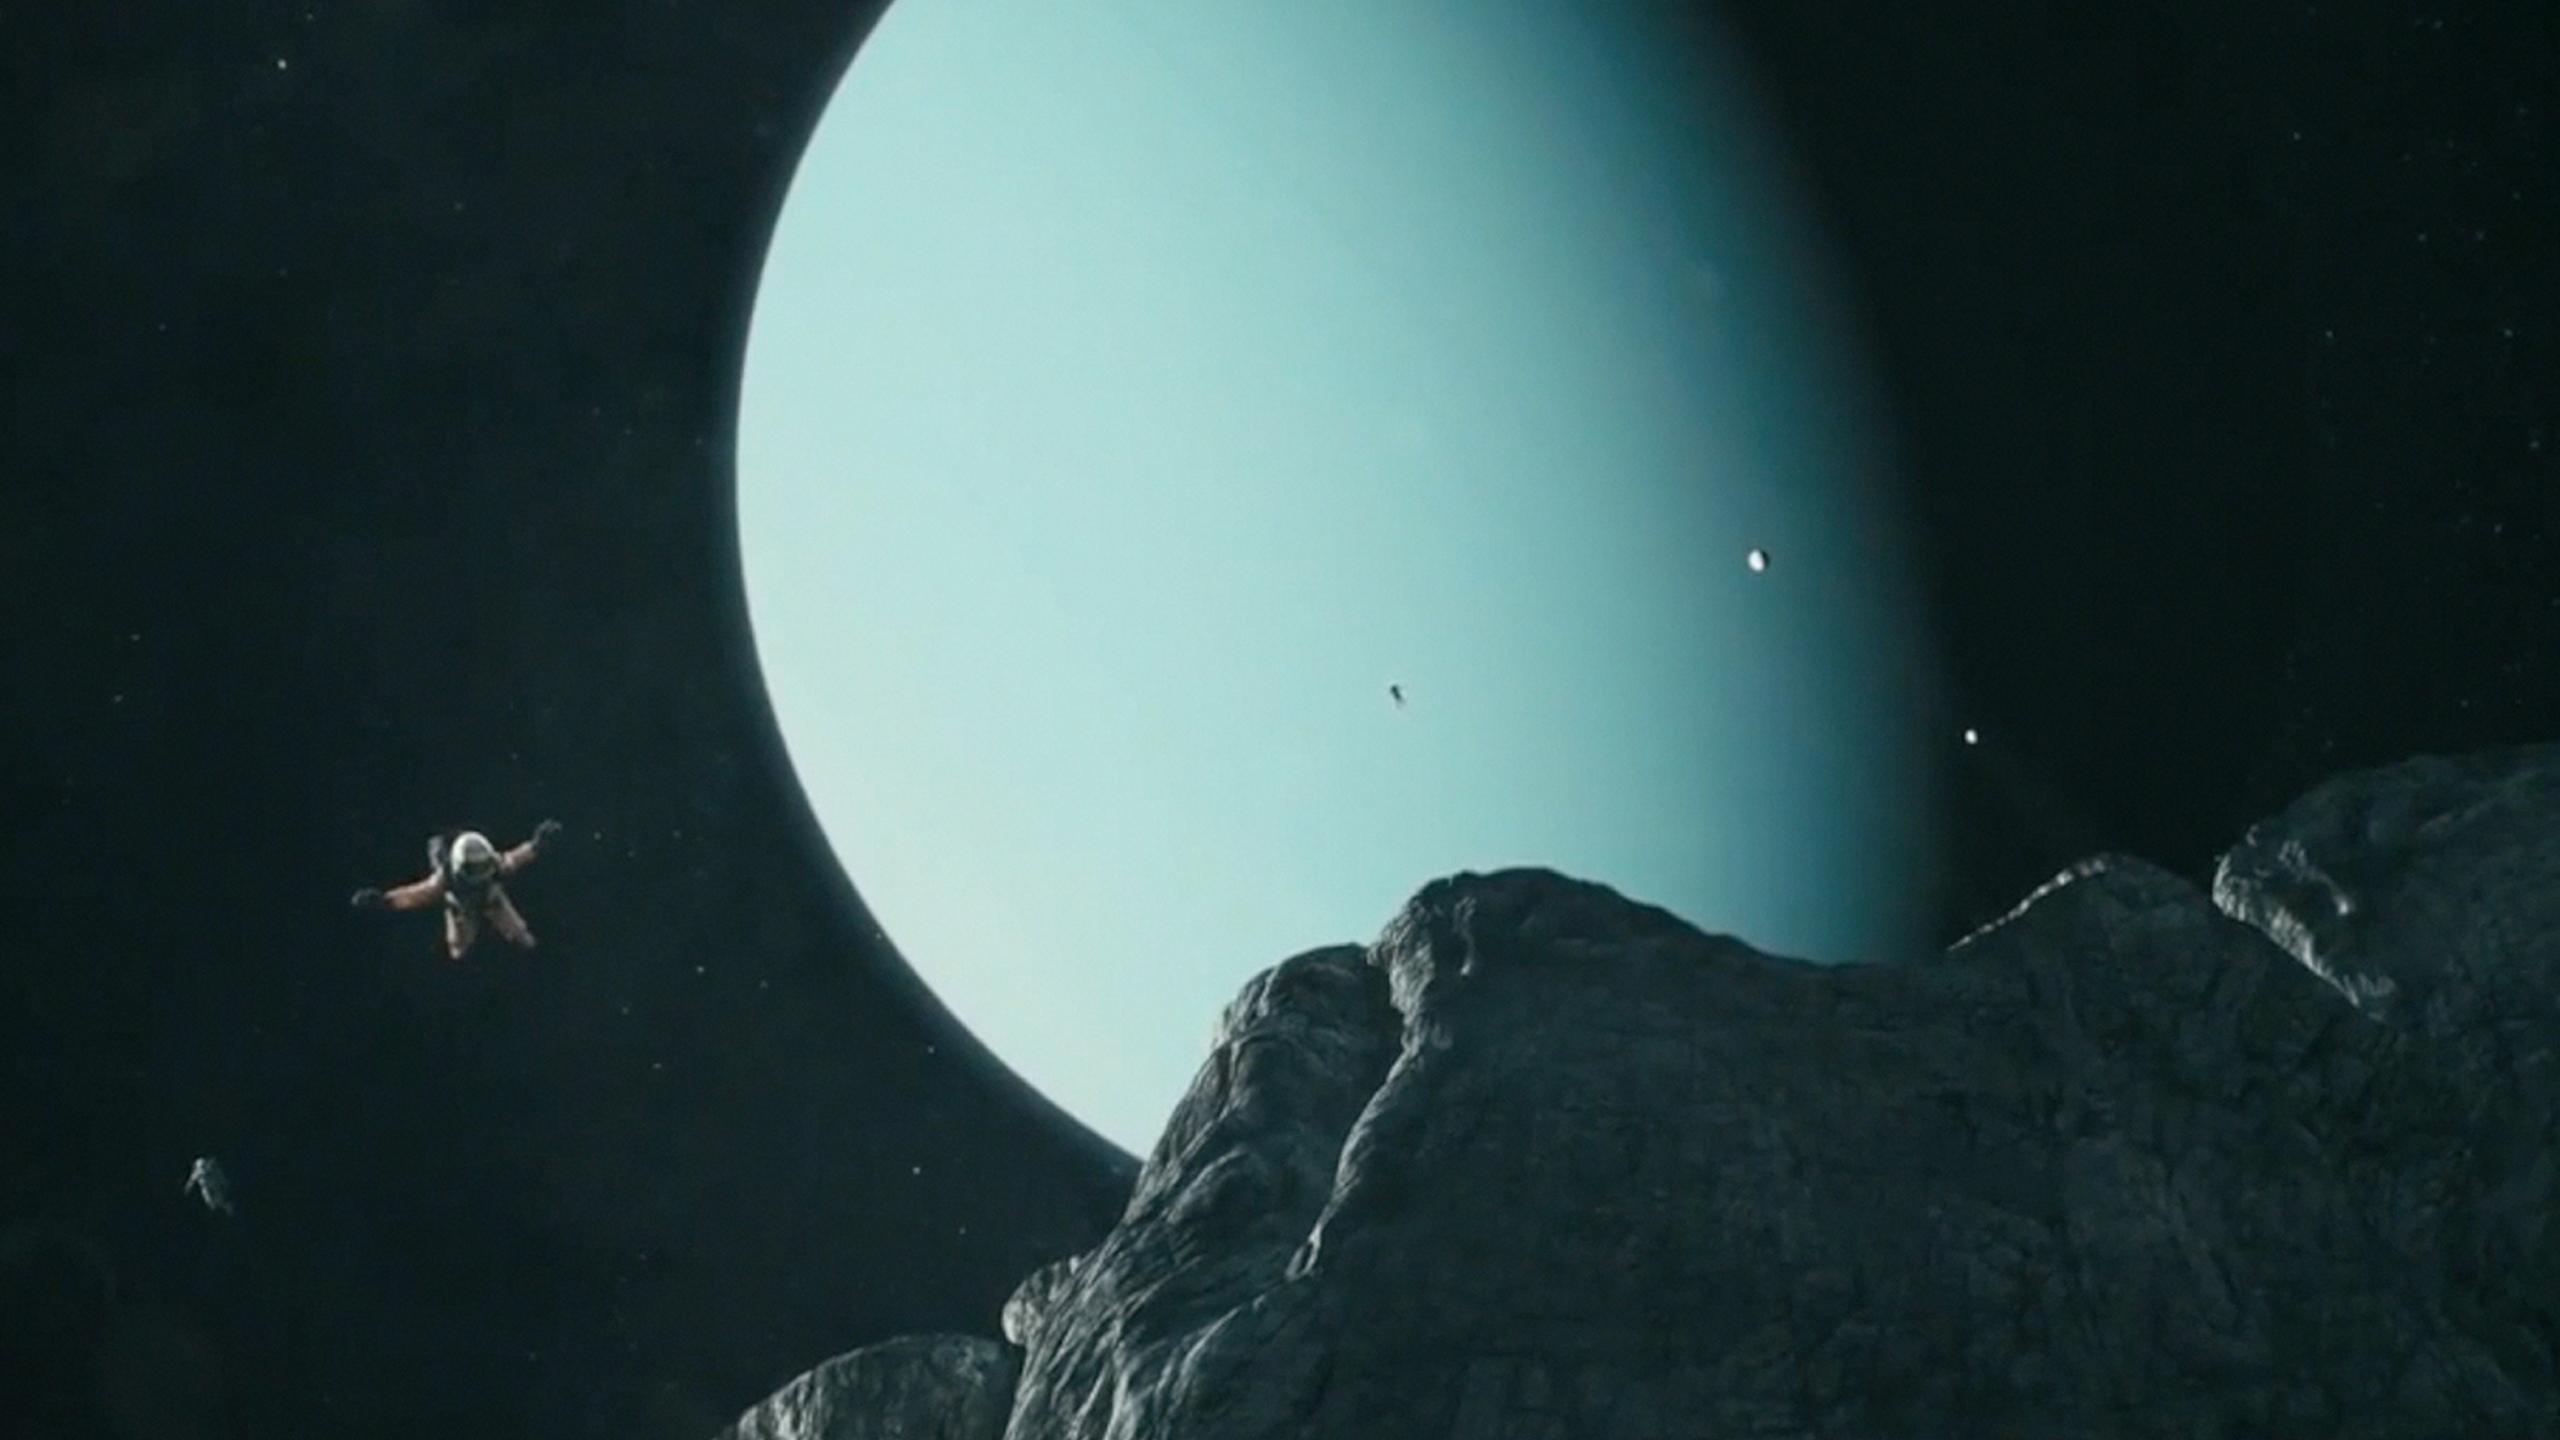 Grey Saturn